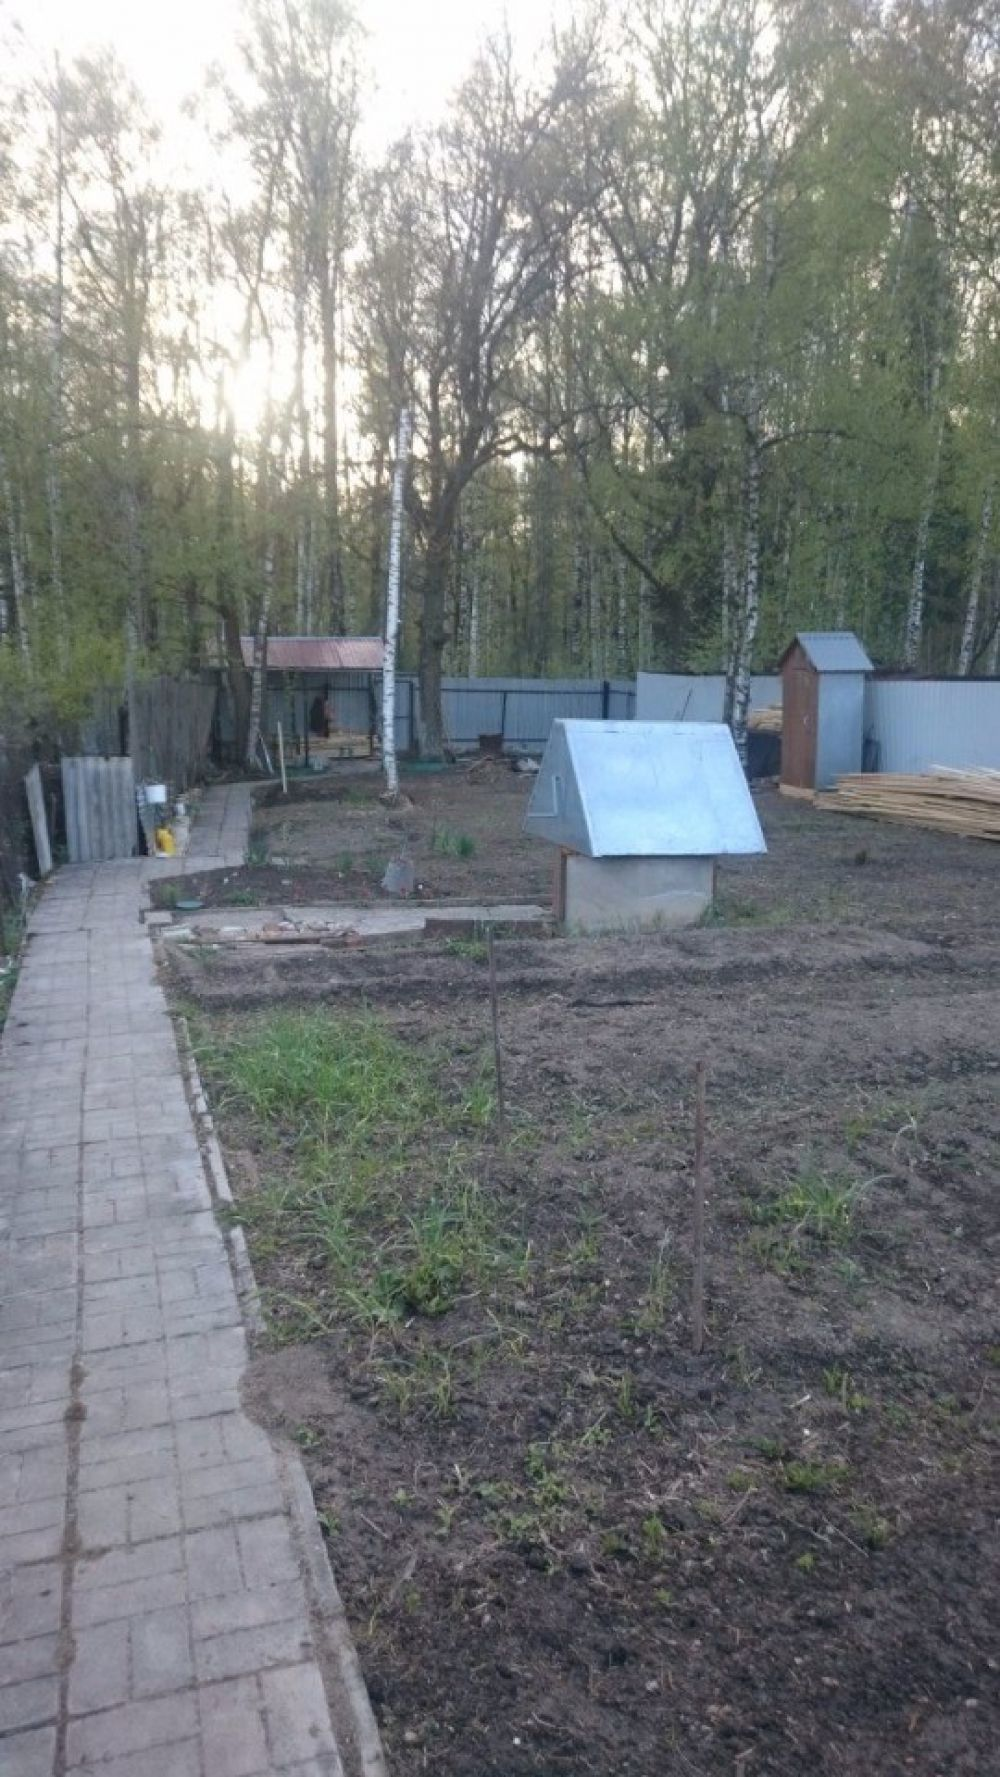 Дача 72 м2, участок 8 соток, г. Щелково, СНТ Дубки, фото 6